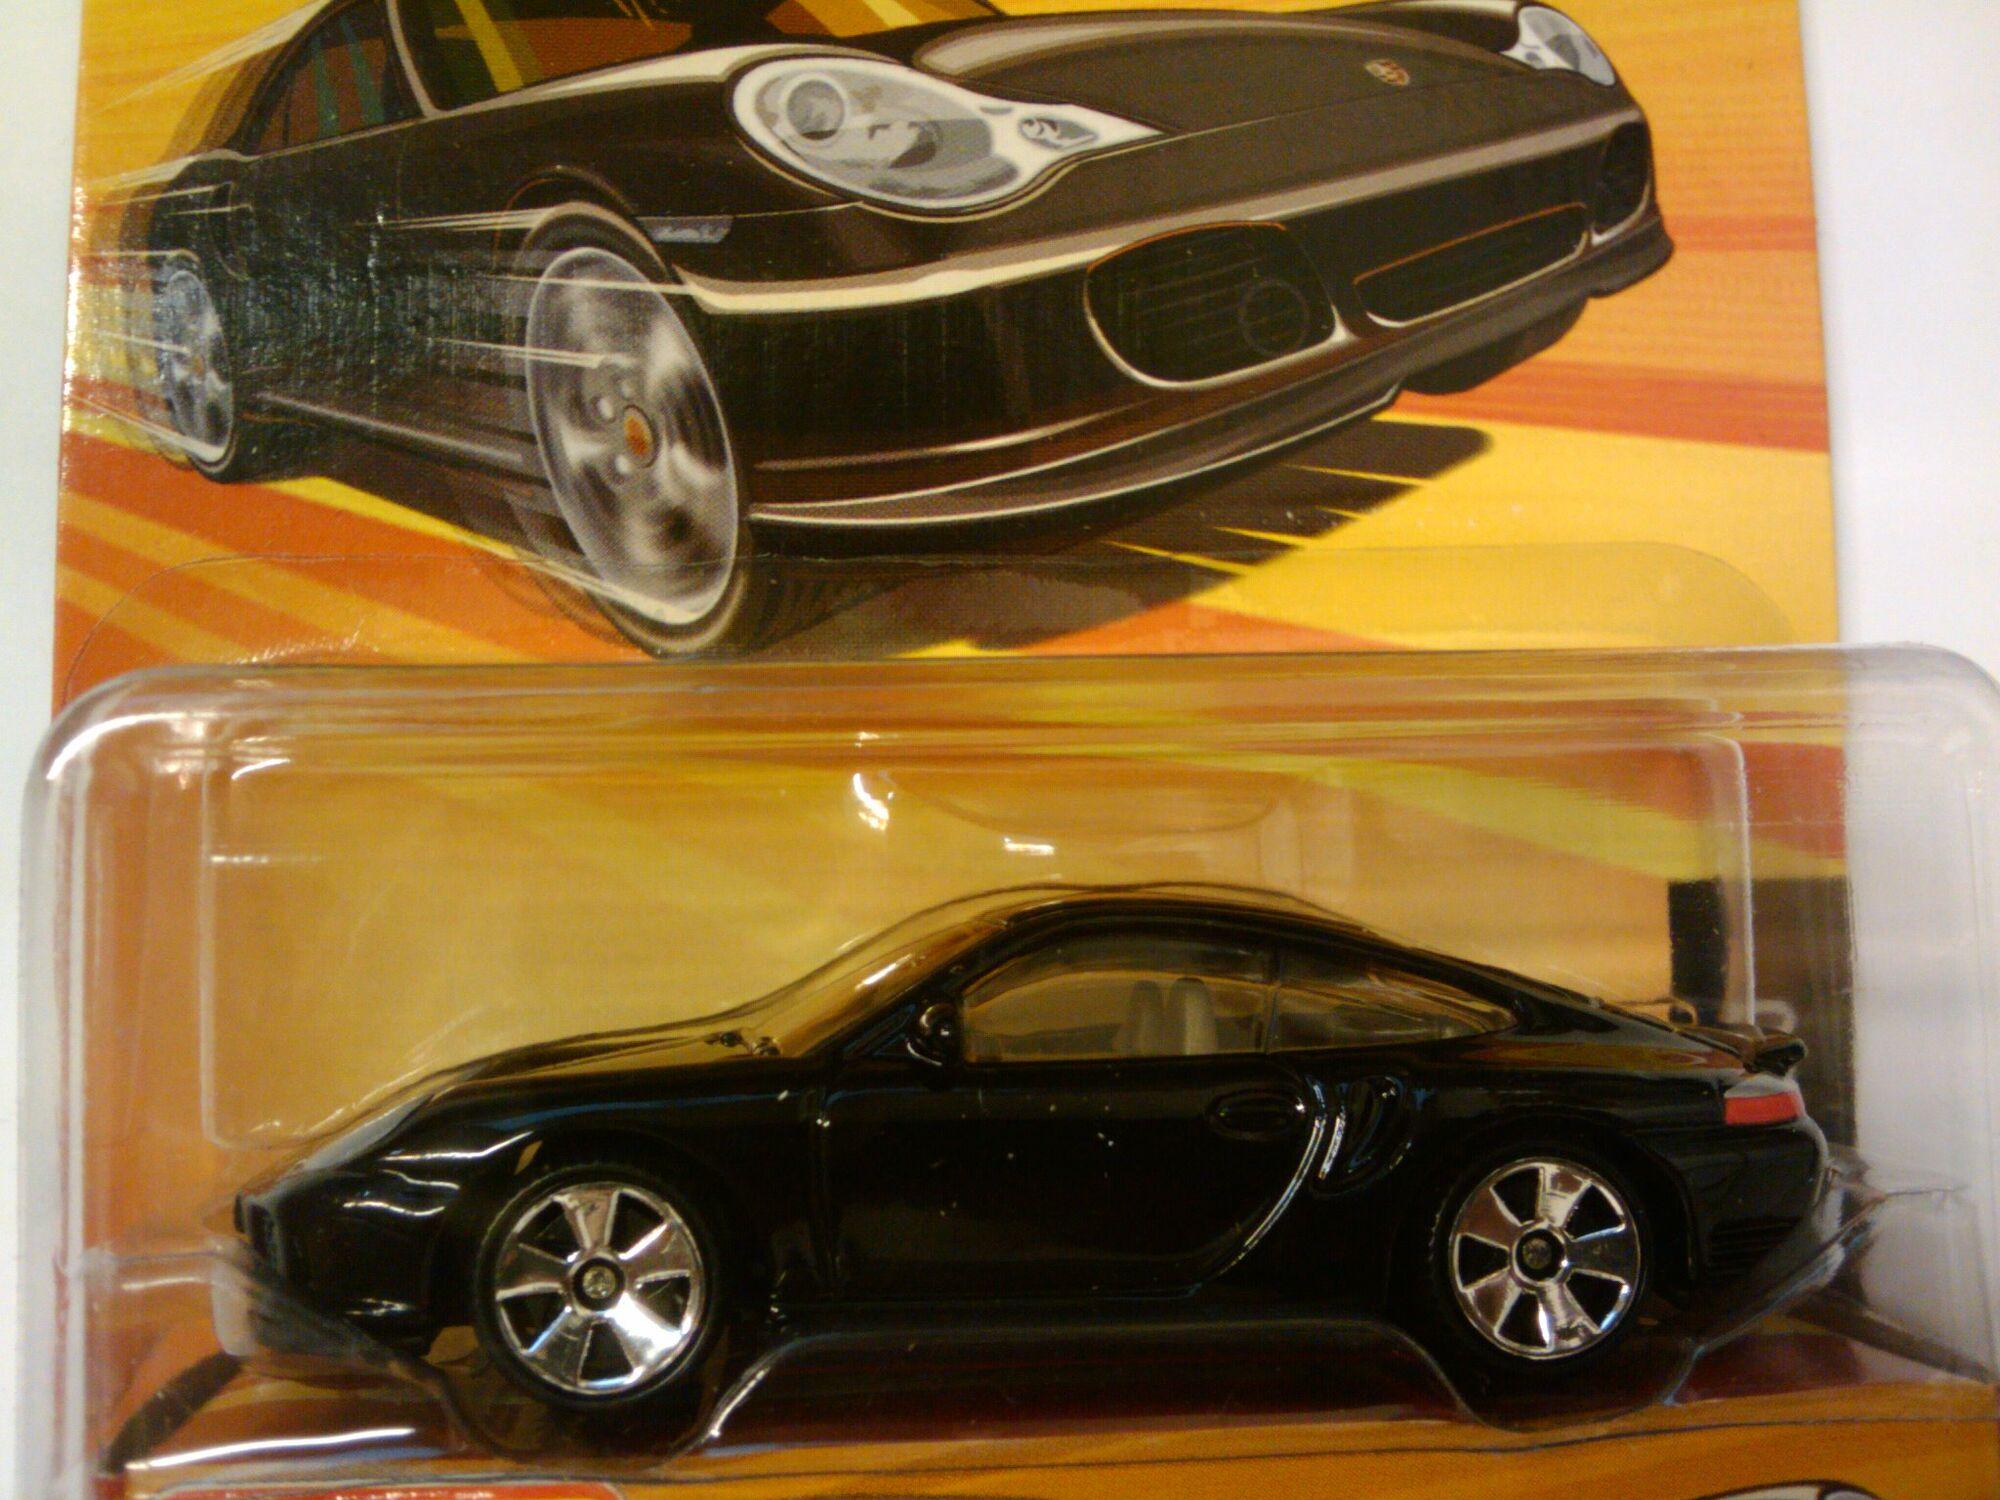 image superfast porsche 911 turbo blackjpg matchbox cars wiki fandom powered by wikia - Porsche 911 Turbo Black 2000